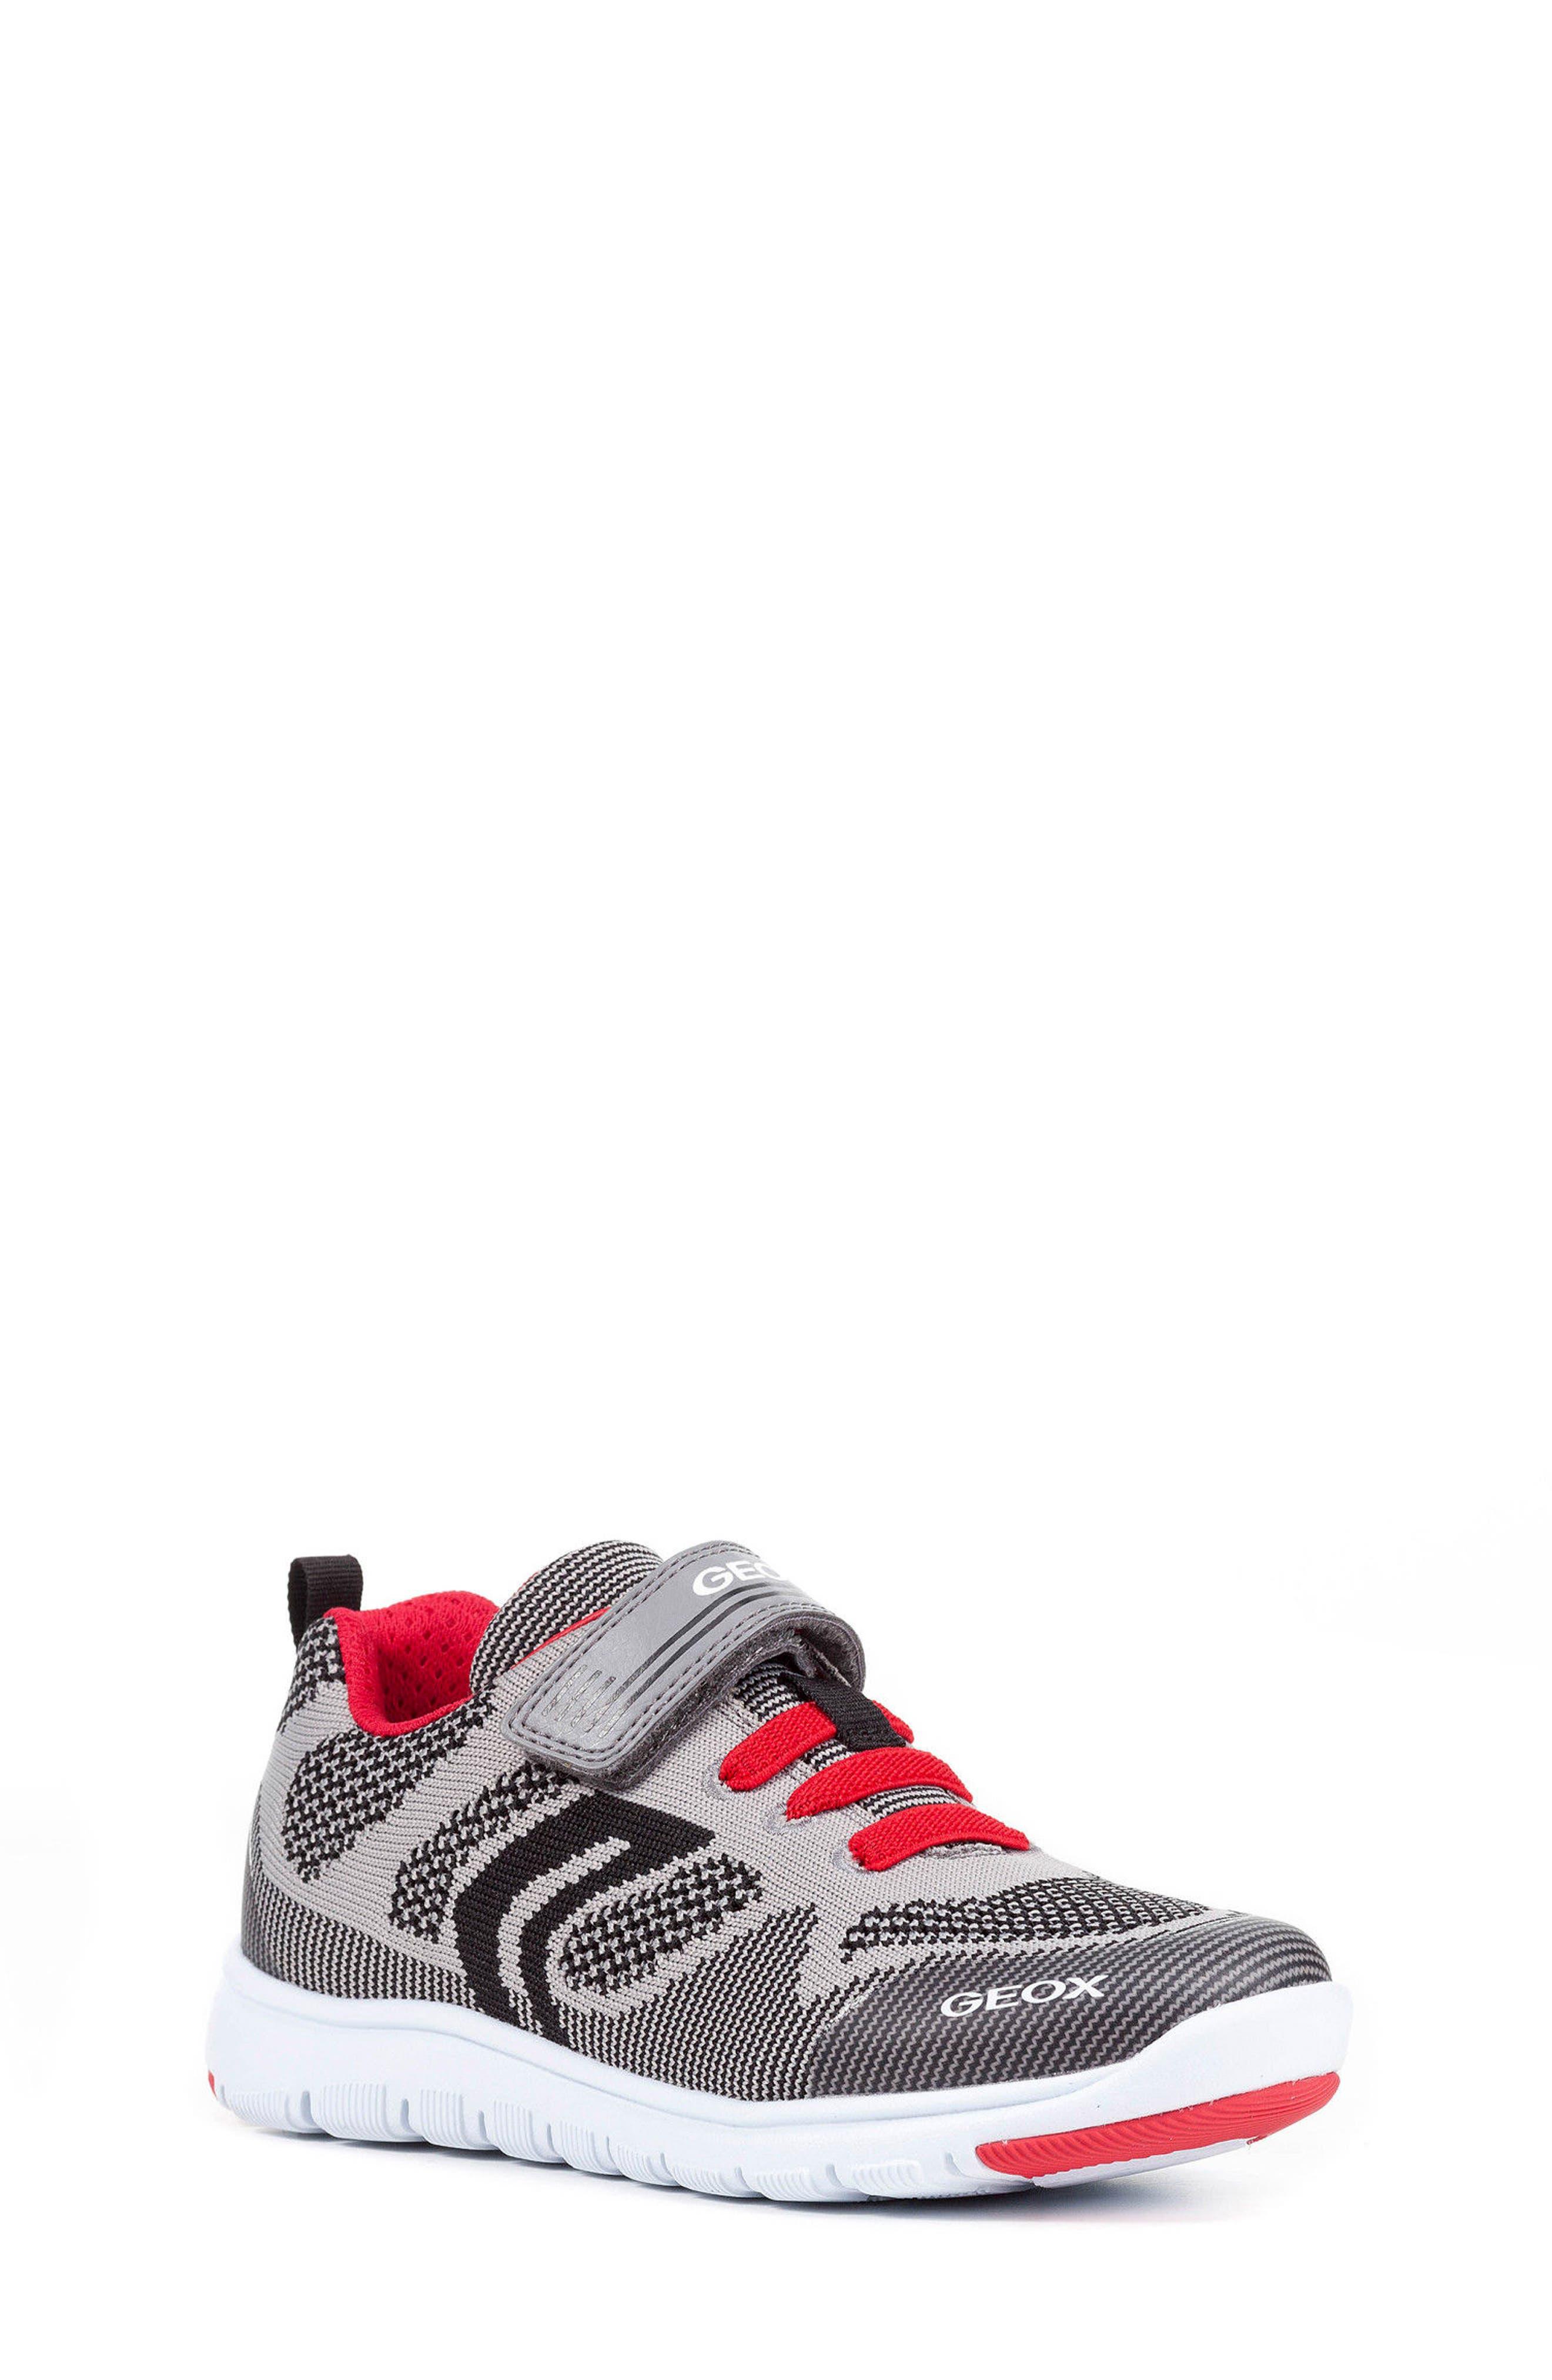 Xunday Low Top Woven Sneaker,                             Main thumbnail 1, color,                             063